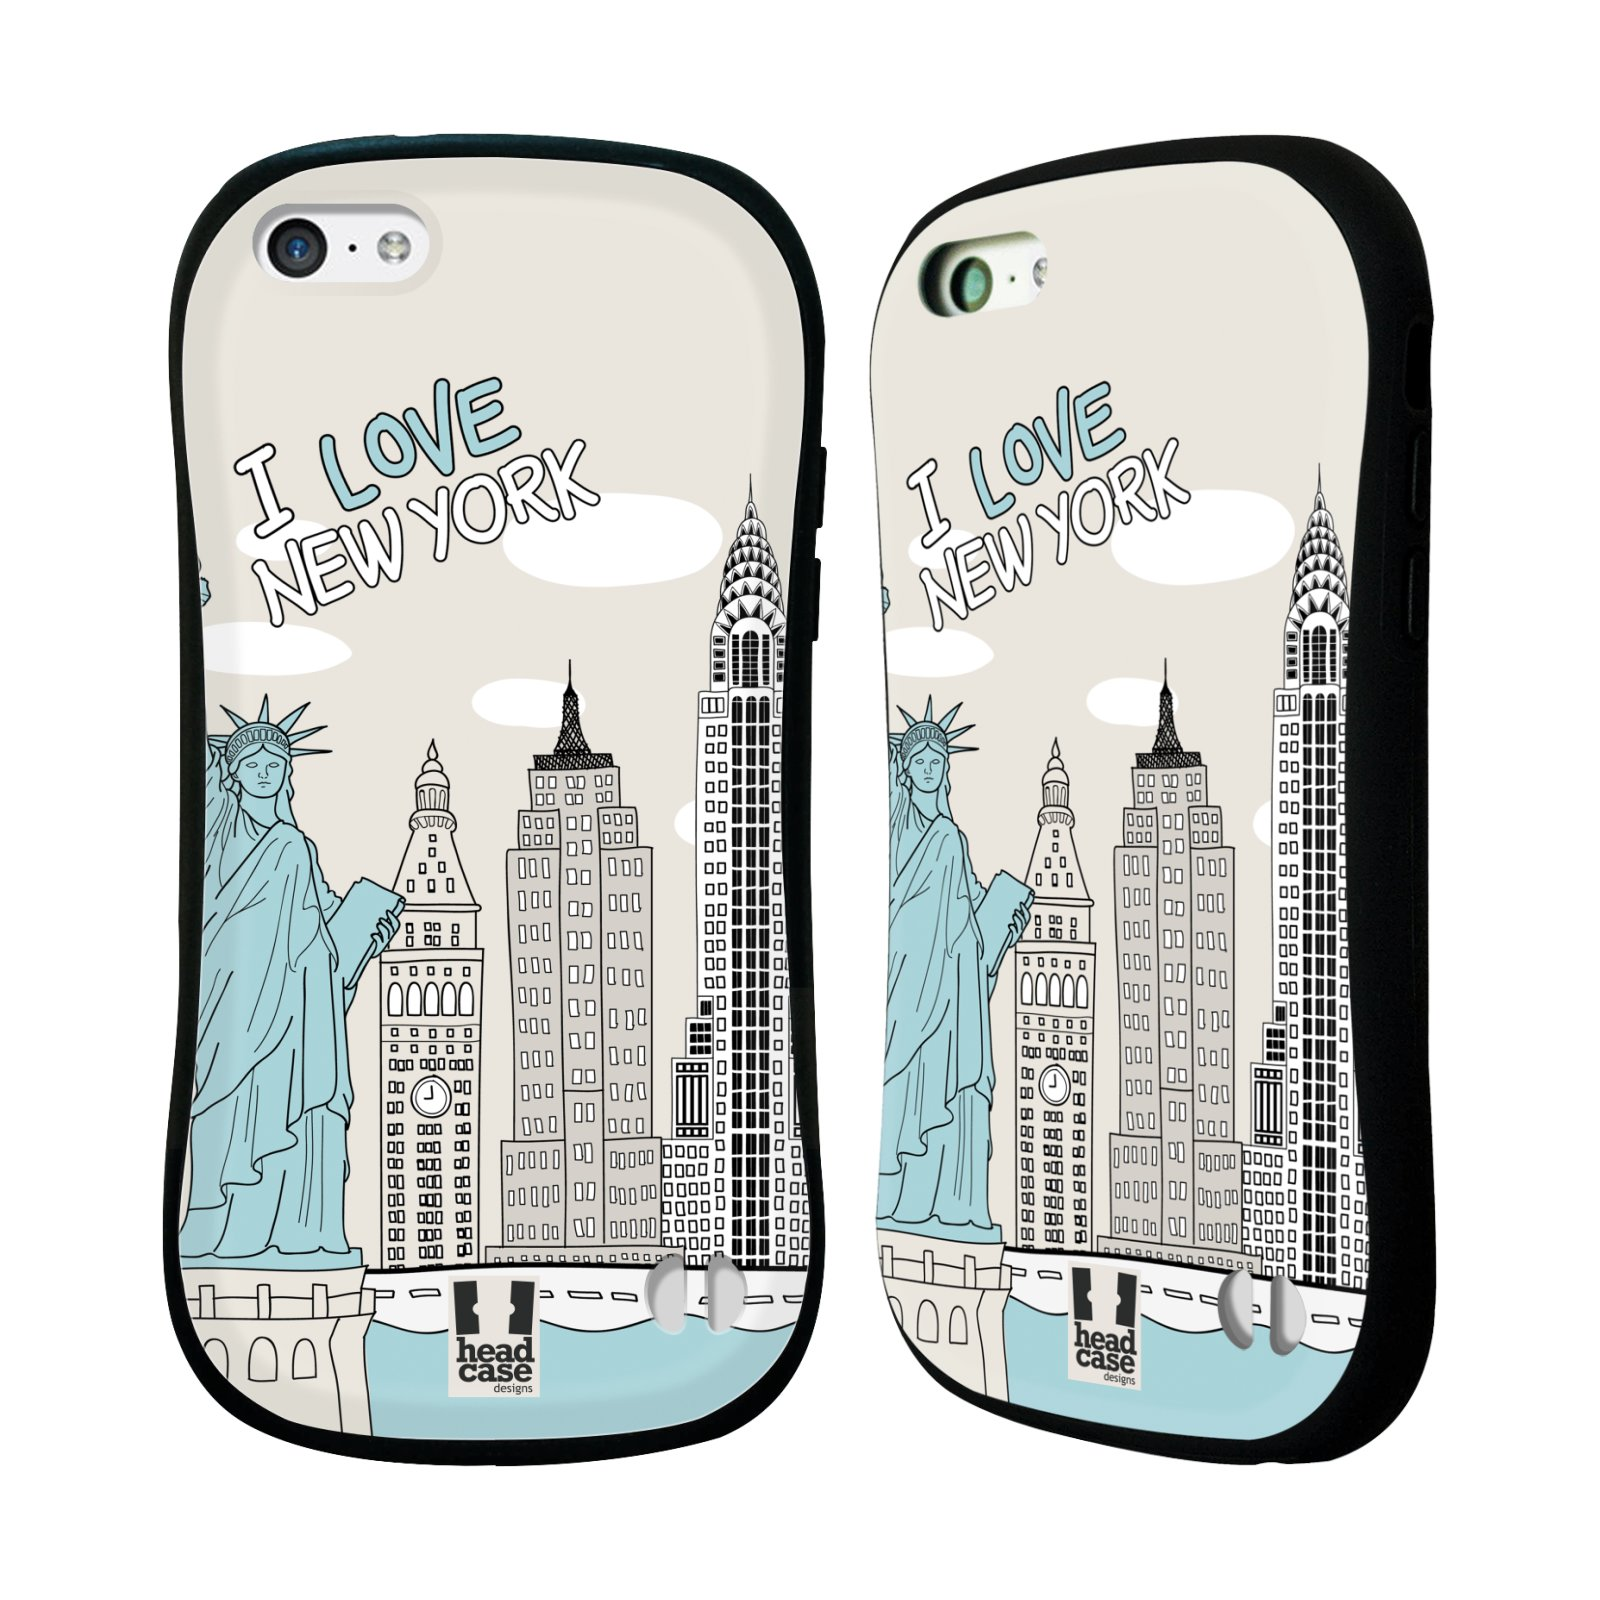 HEAD CASE silikon/plast odolný obal na mobil Apple Iphone 5C vzor Kreslená městečka MODRÁ, USA, New York, I LOVE NEW YORK